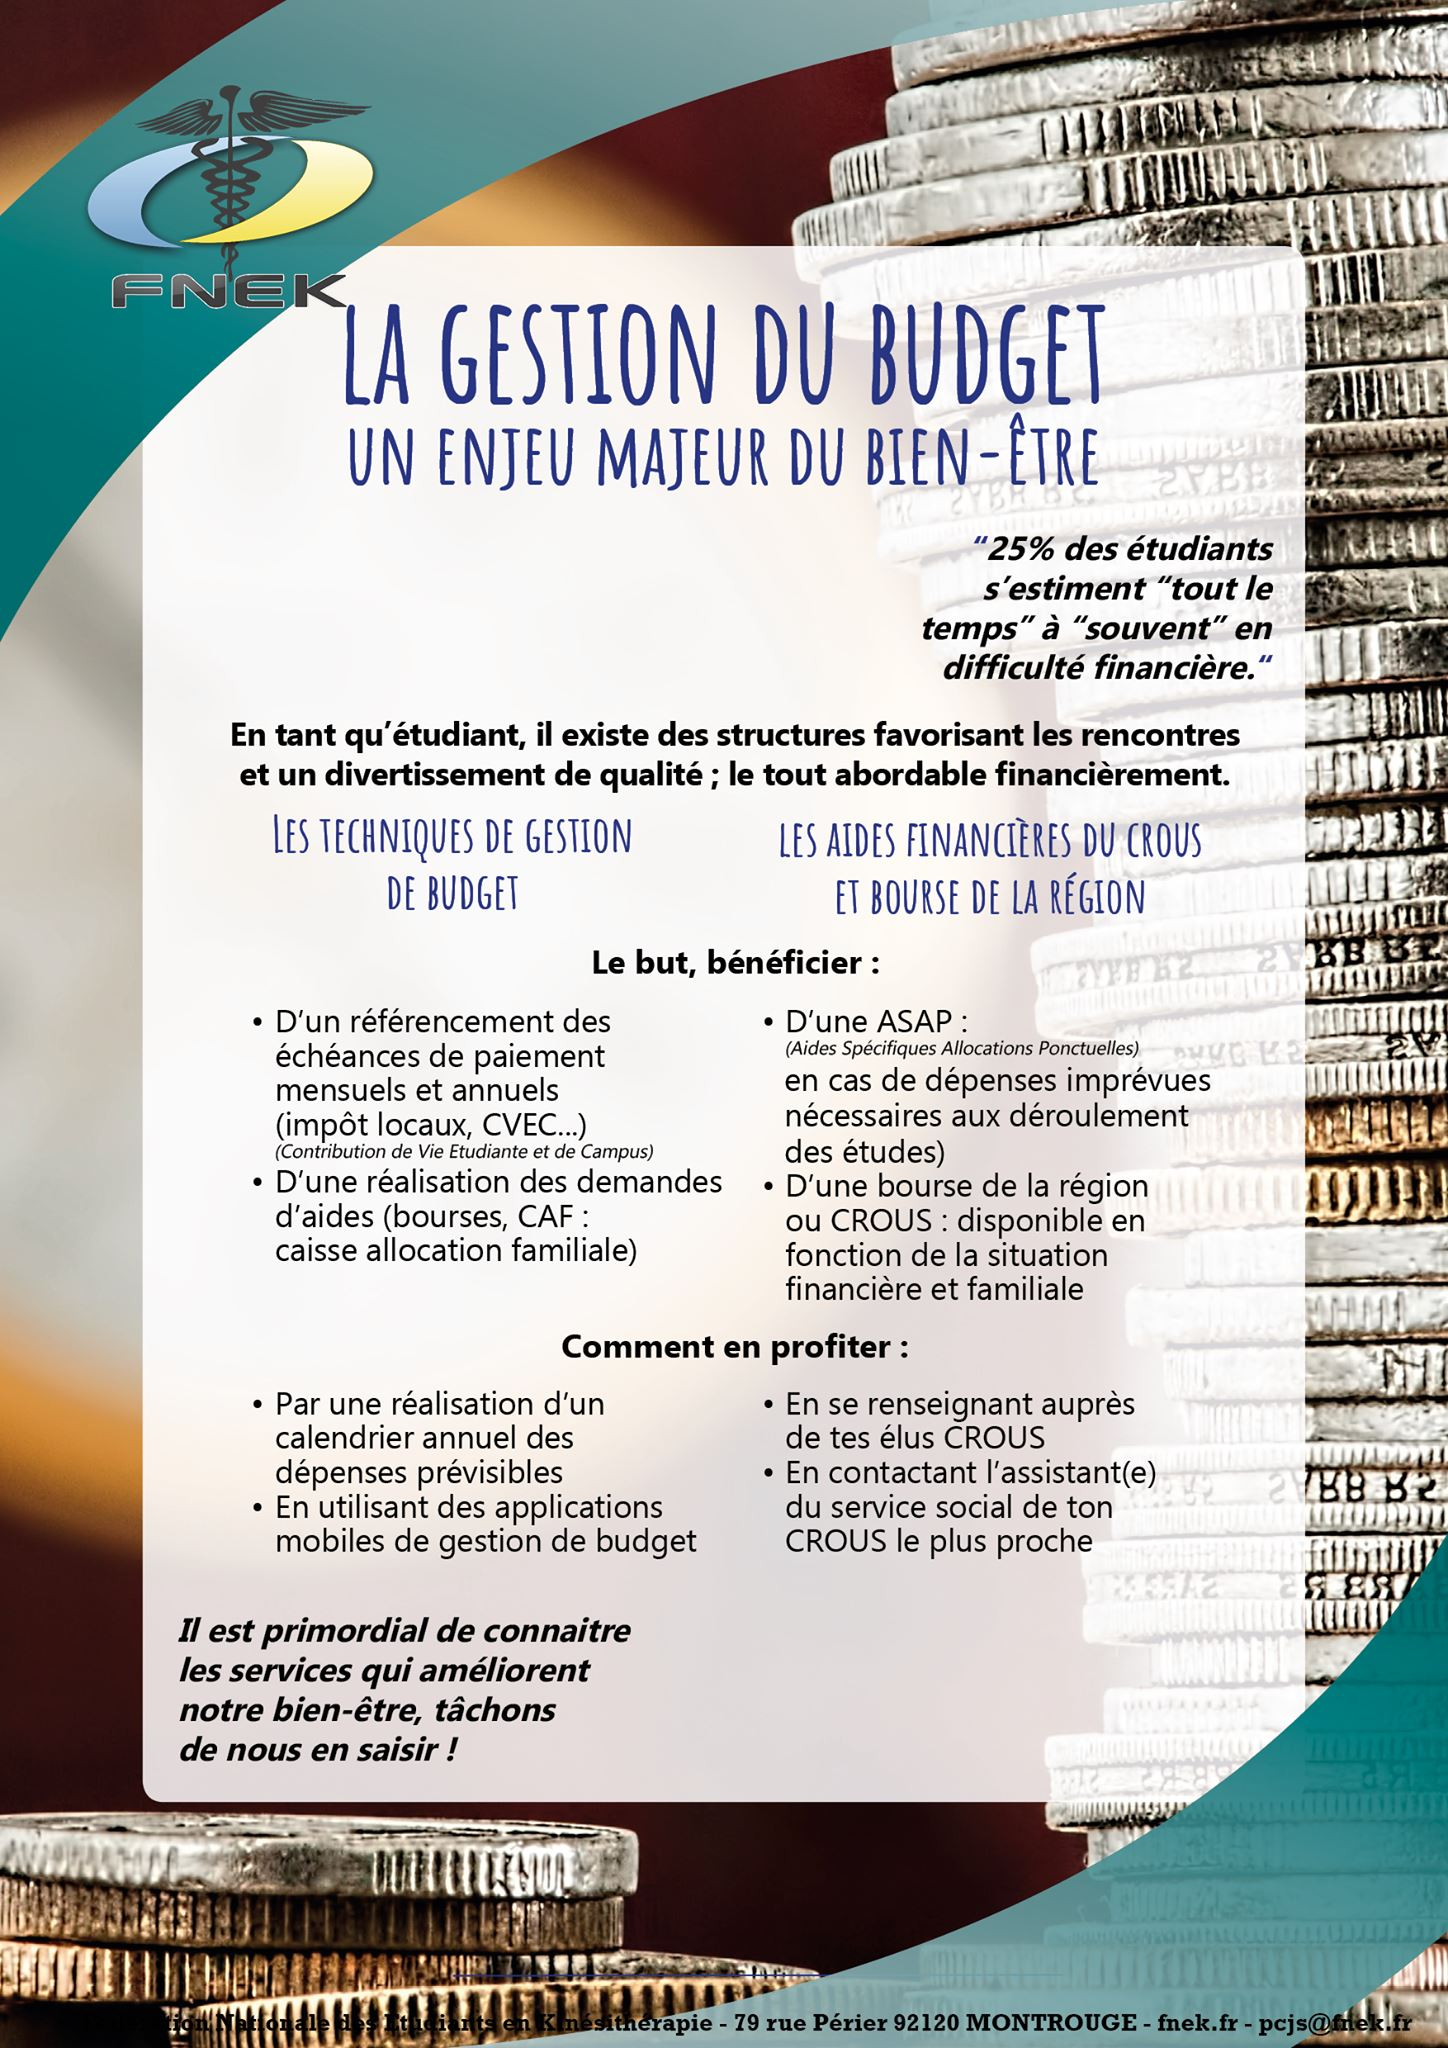 Gestion du budget